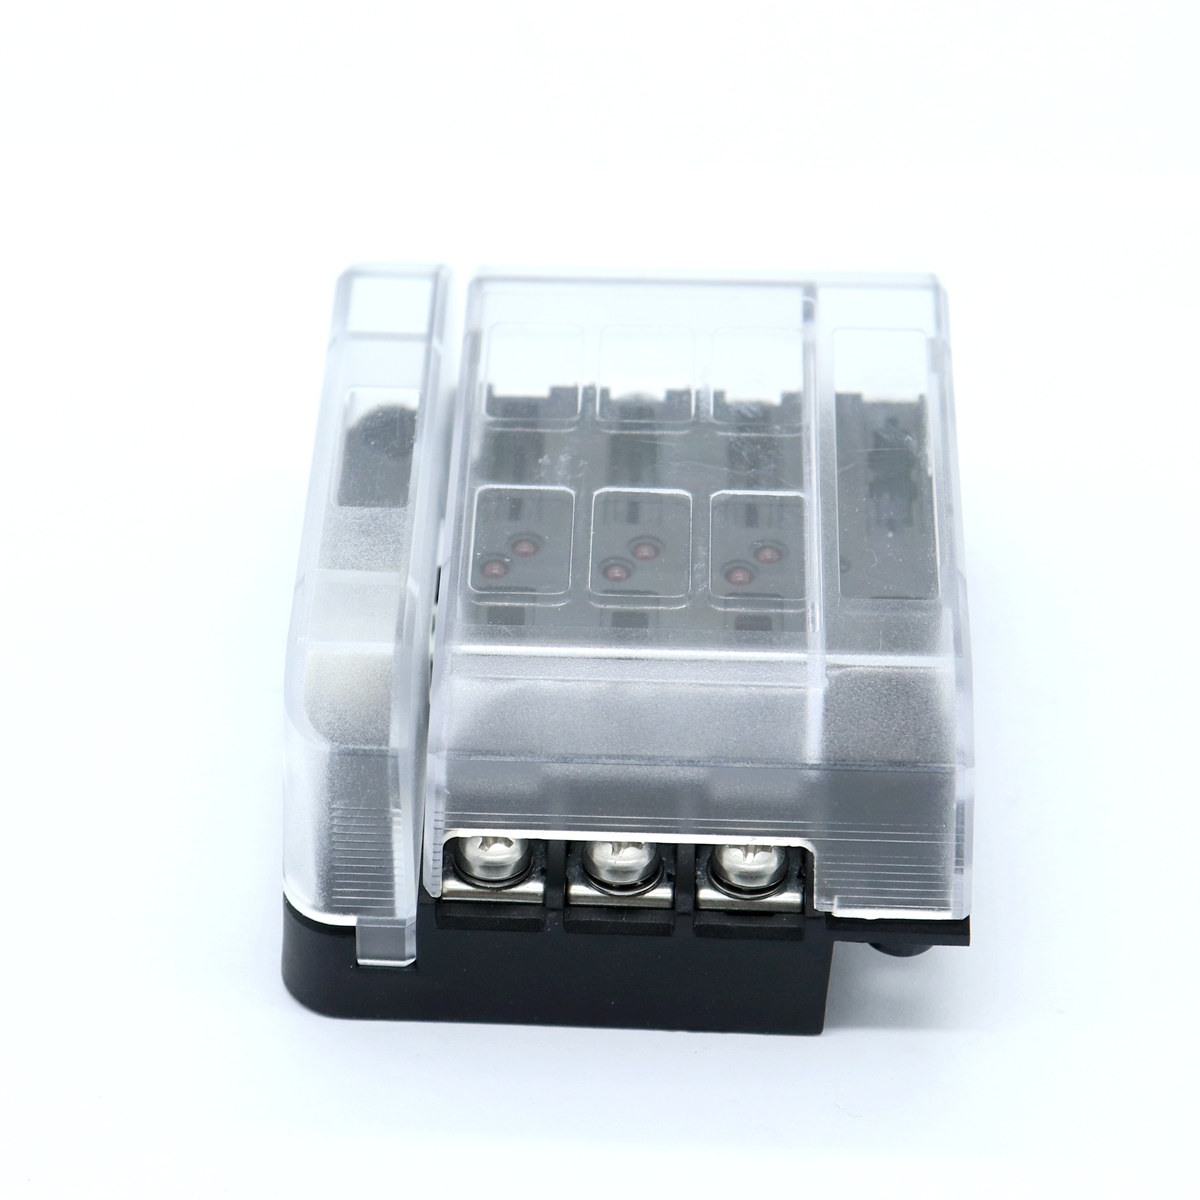 6p atv fuse box wiring library6p atv fuse box [ 1200 x 1200 Pixel ]